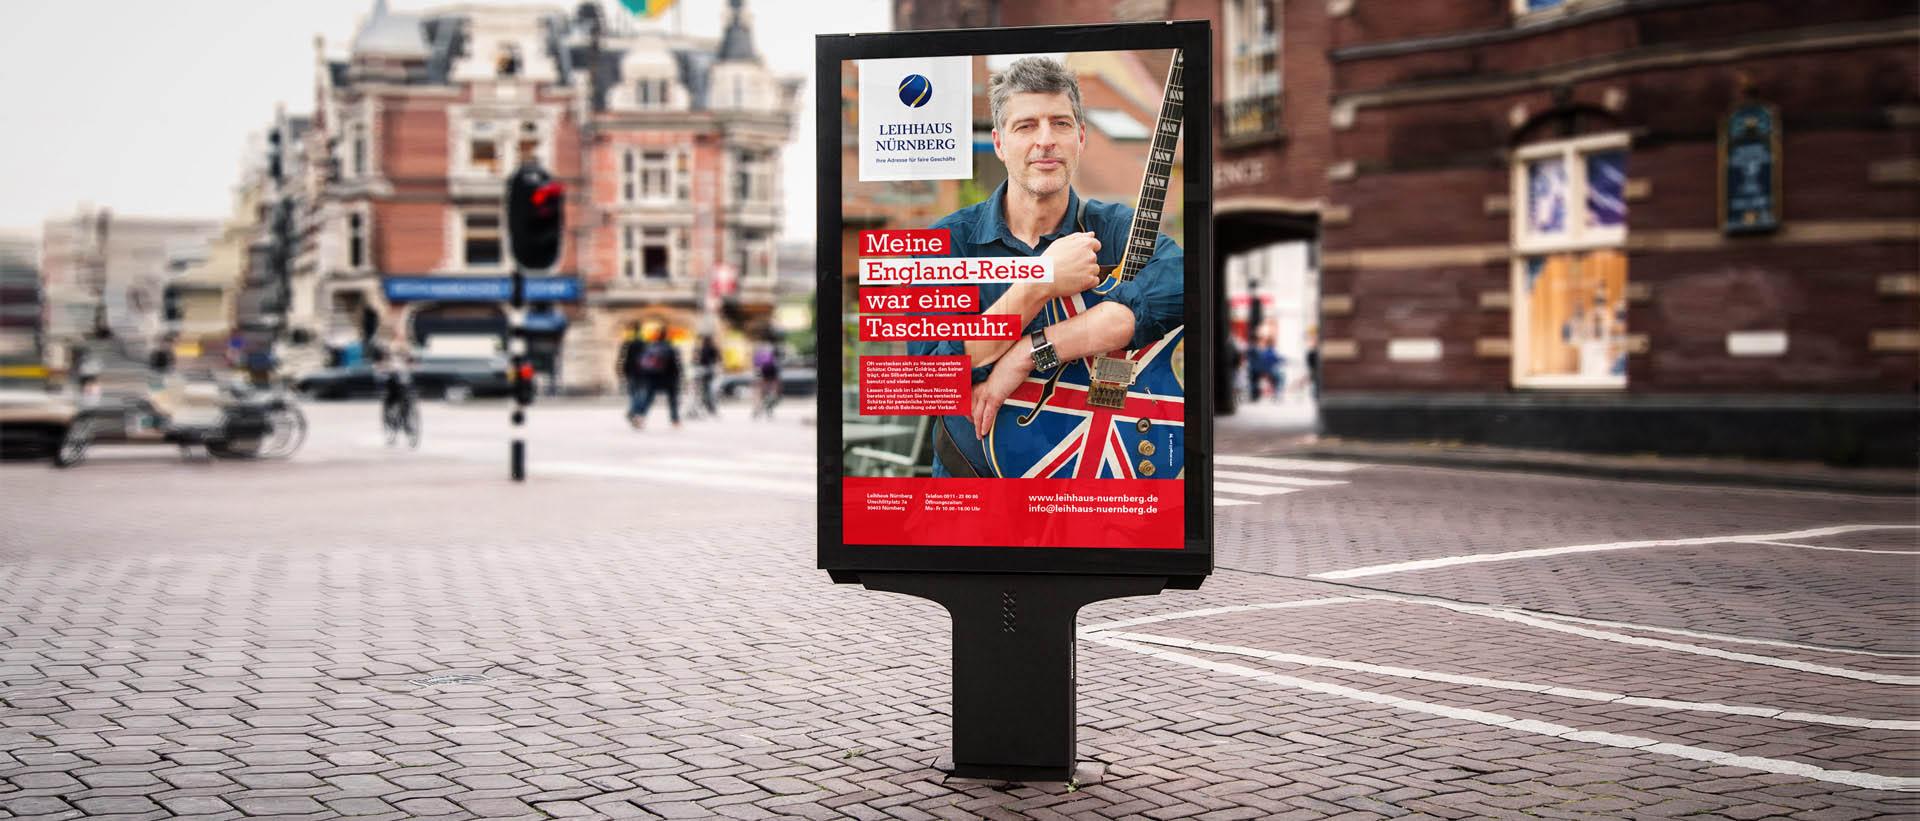 Außenwerbung vom Profi - Citylight Kampagne Leihhaus Nürnberg